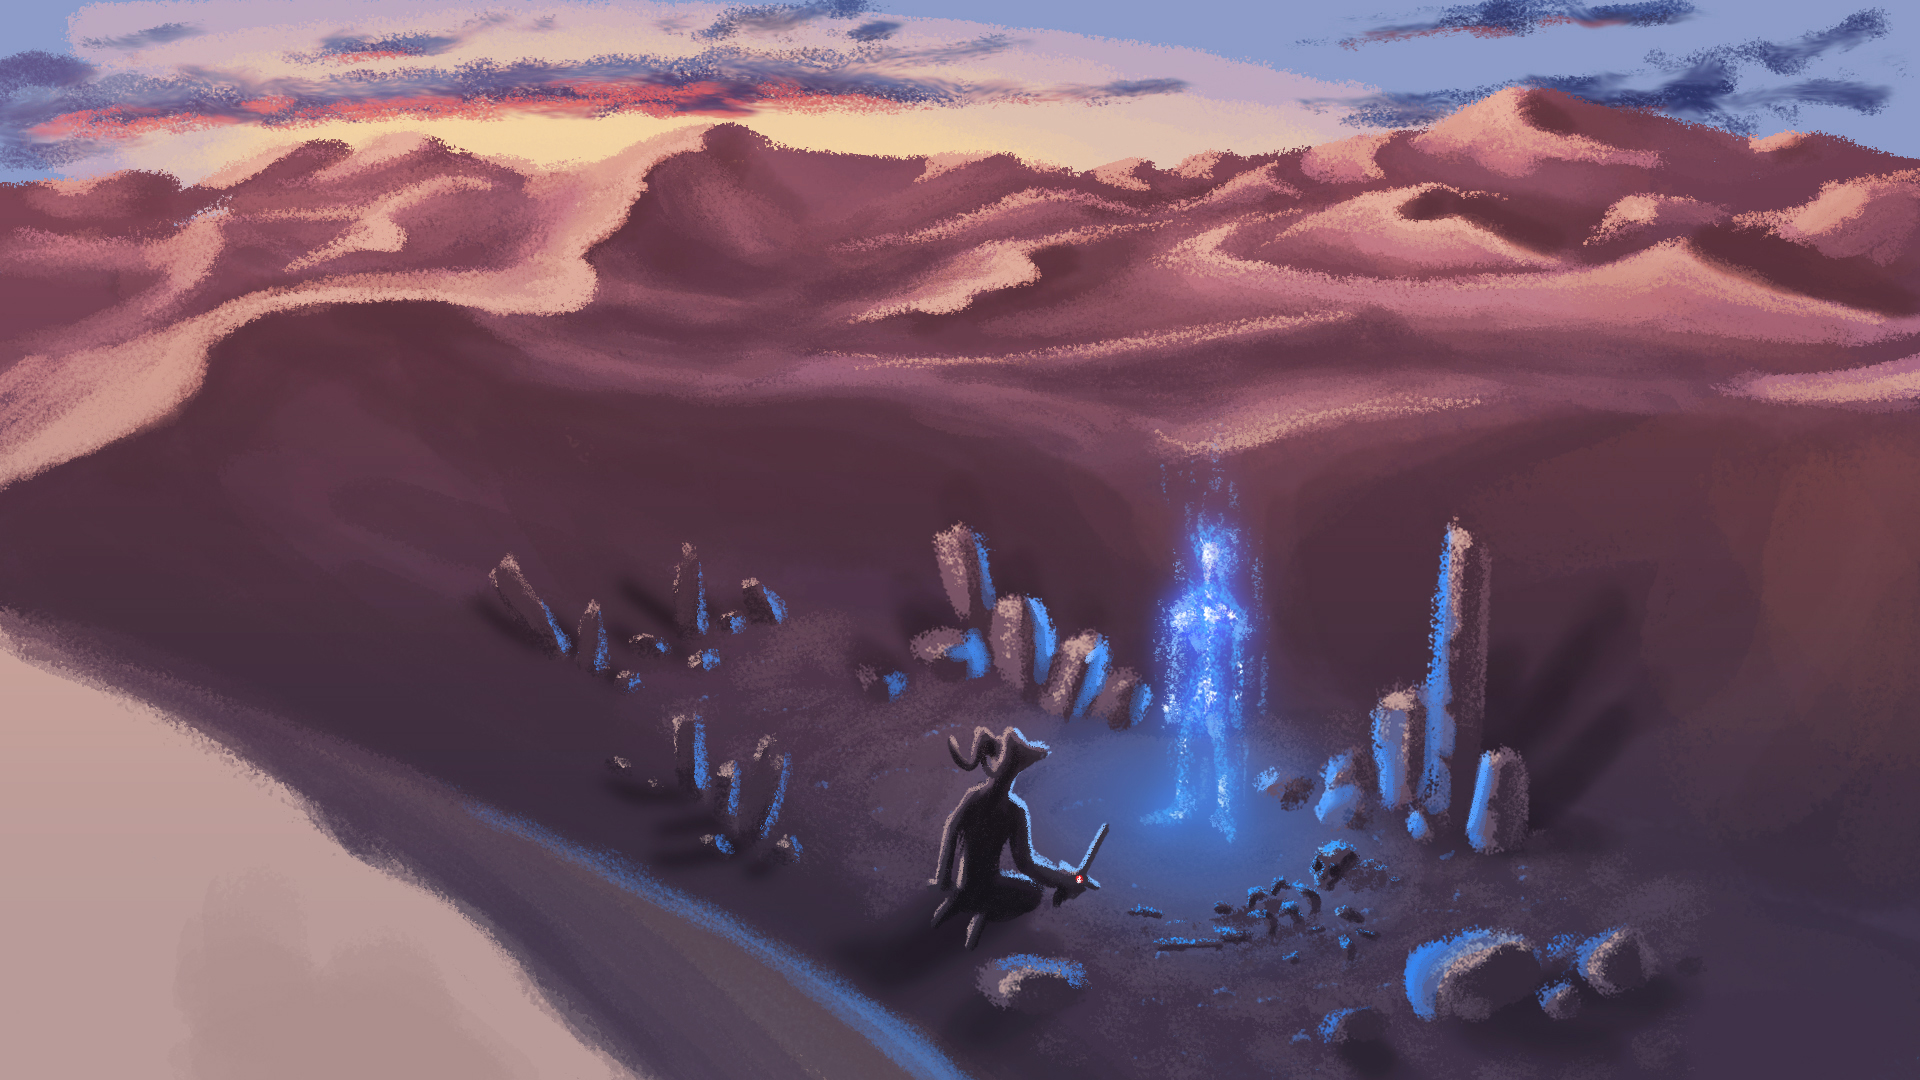 iopren in the desert copy.jpg